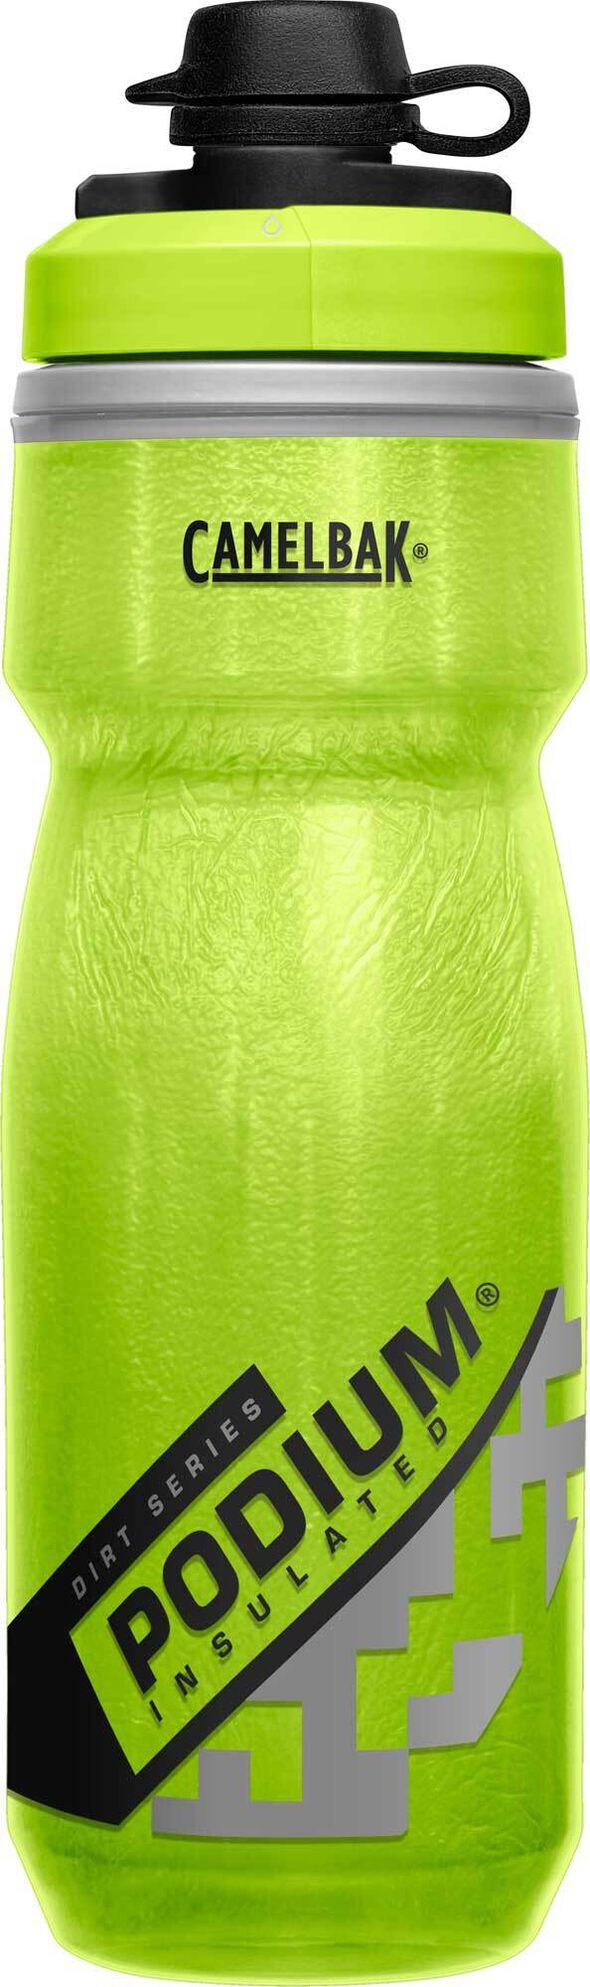 Bouteille D/'Eau 2-Pack environ 595.33 g turquoise 21 oz Genuine Camelbak Podium Chill Dirt Series NEUF